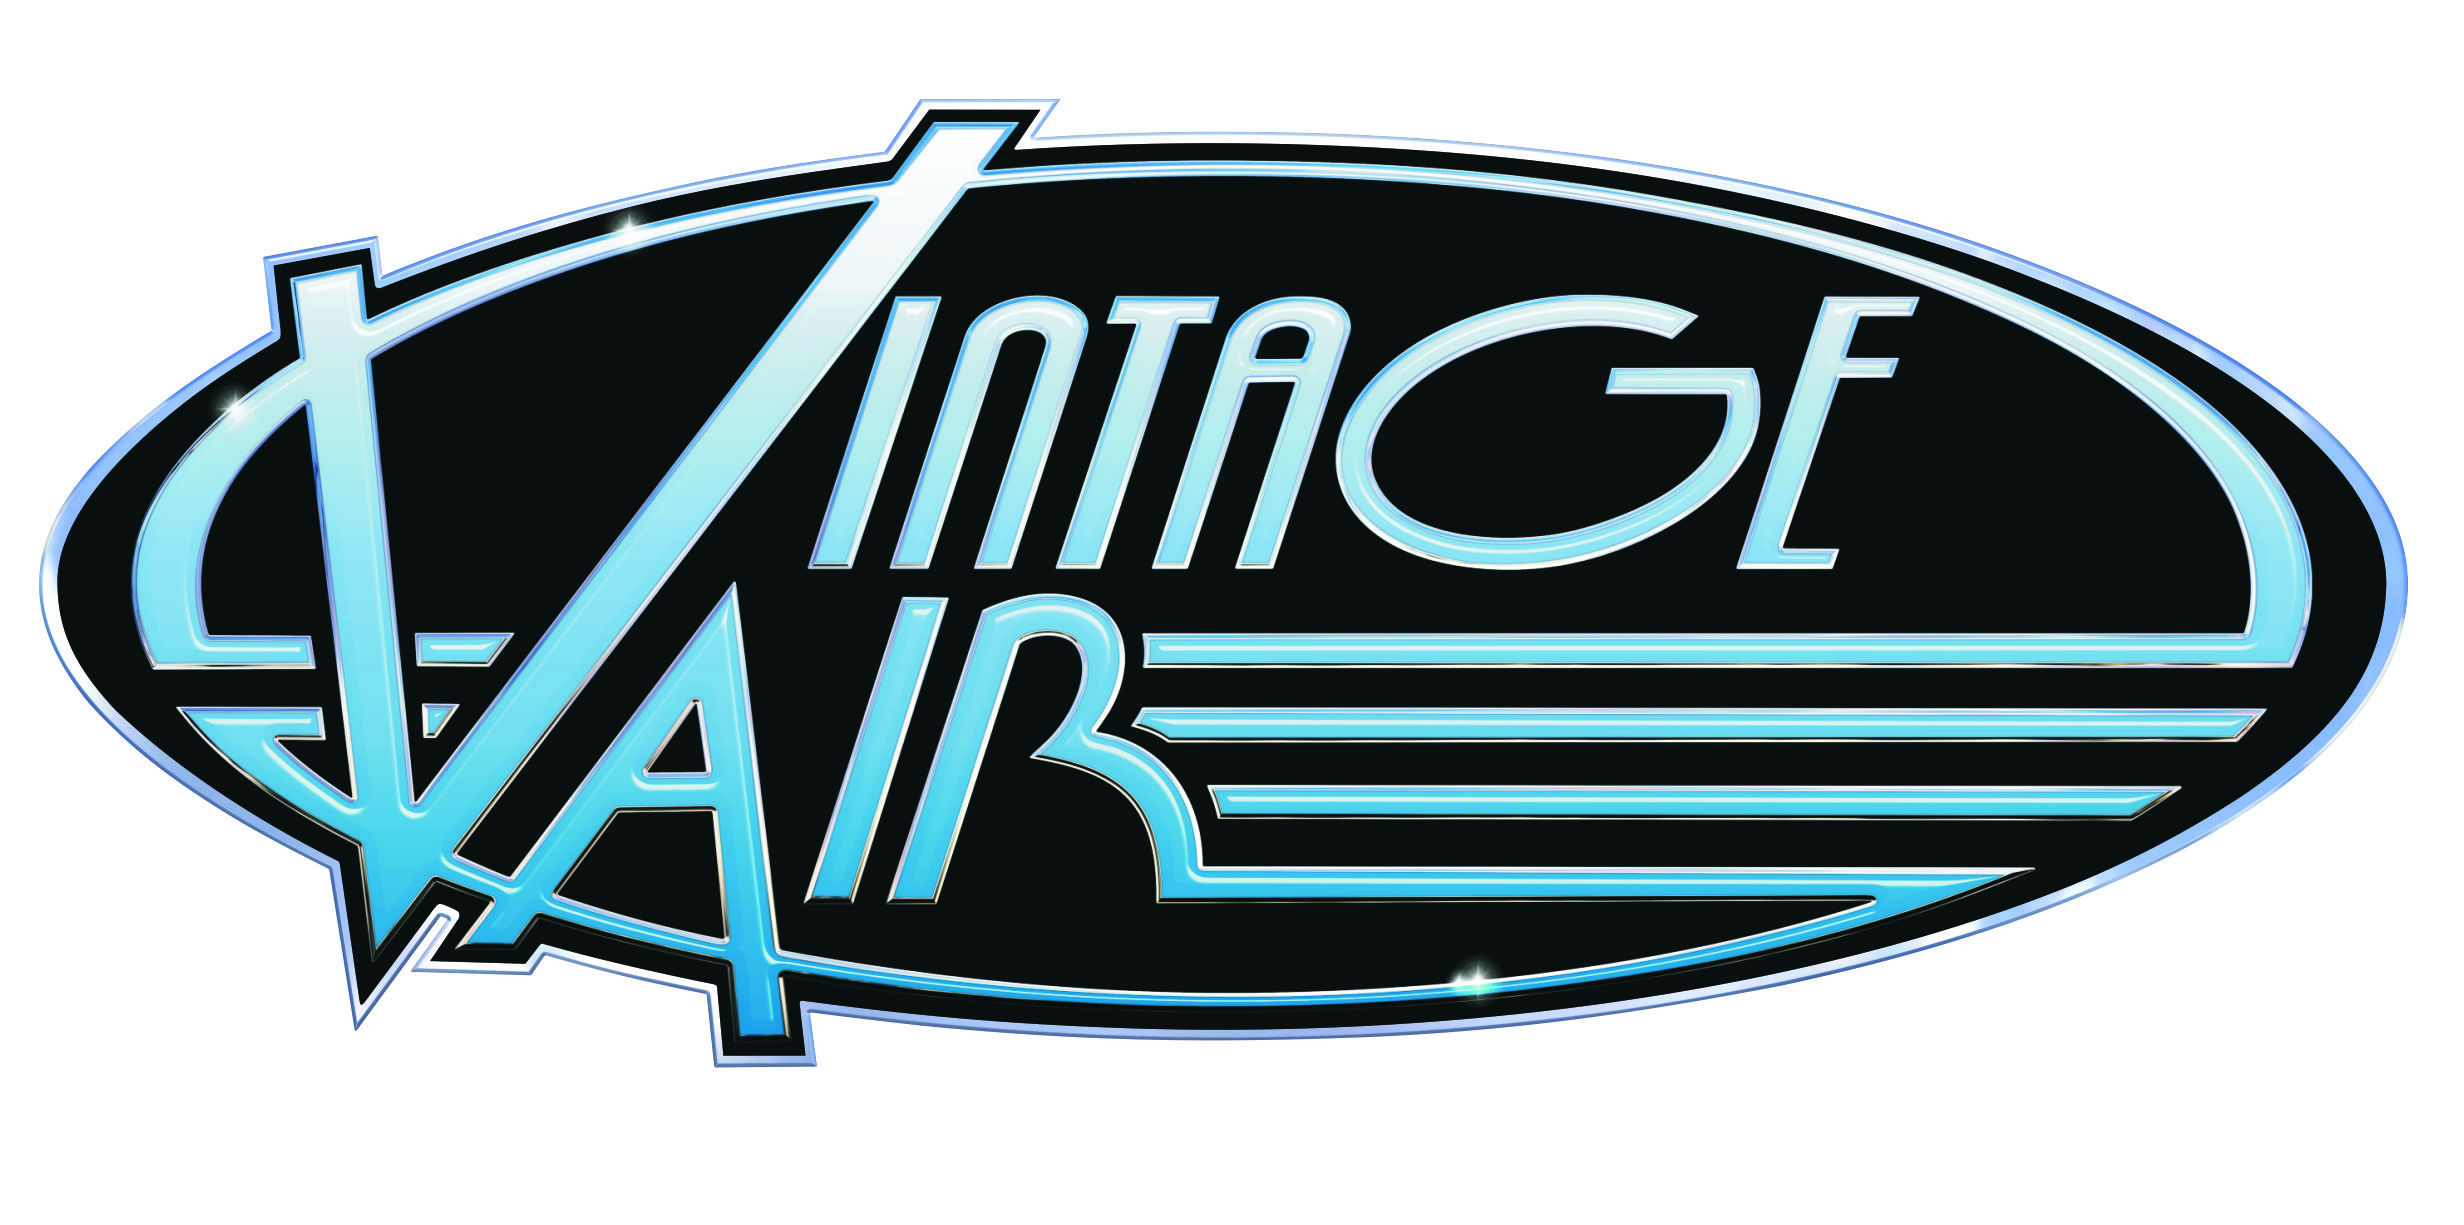 Vintage Air Parts